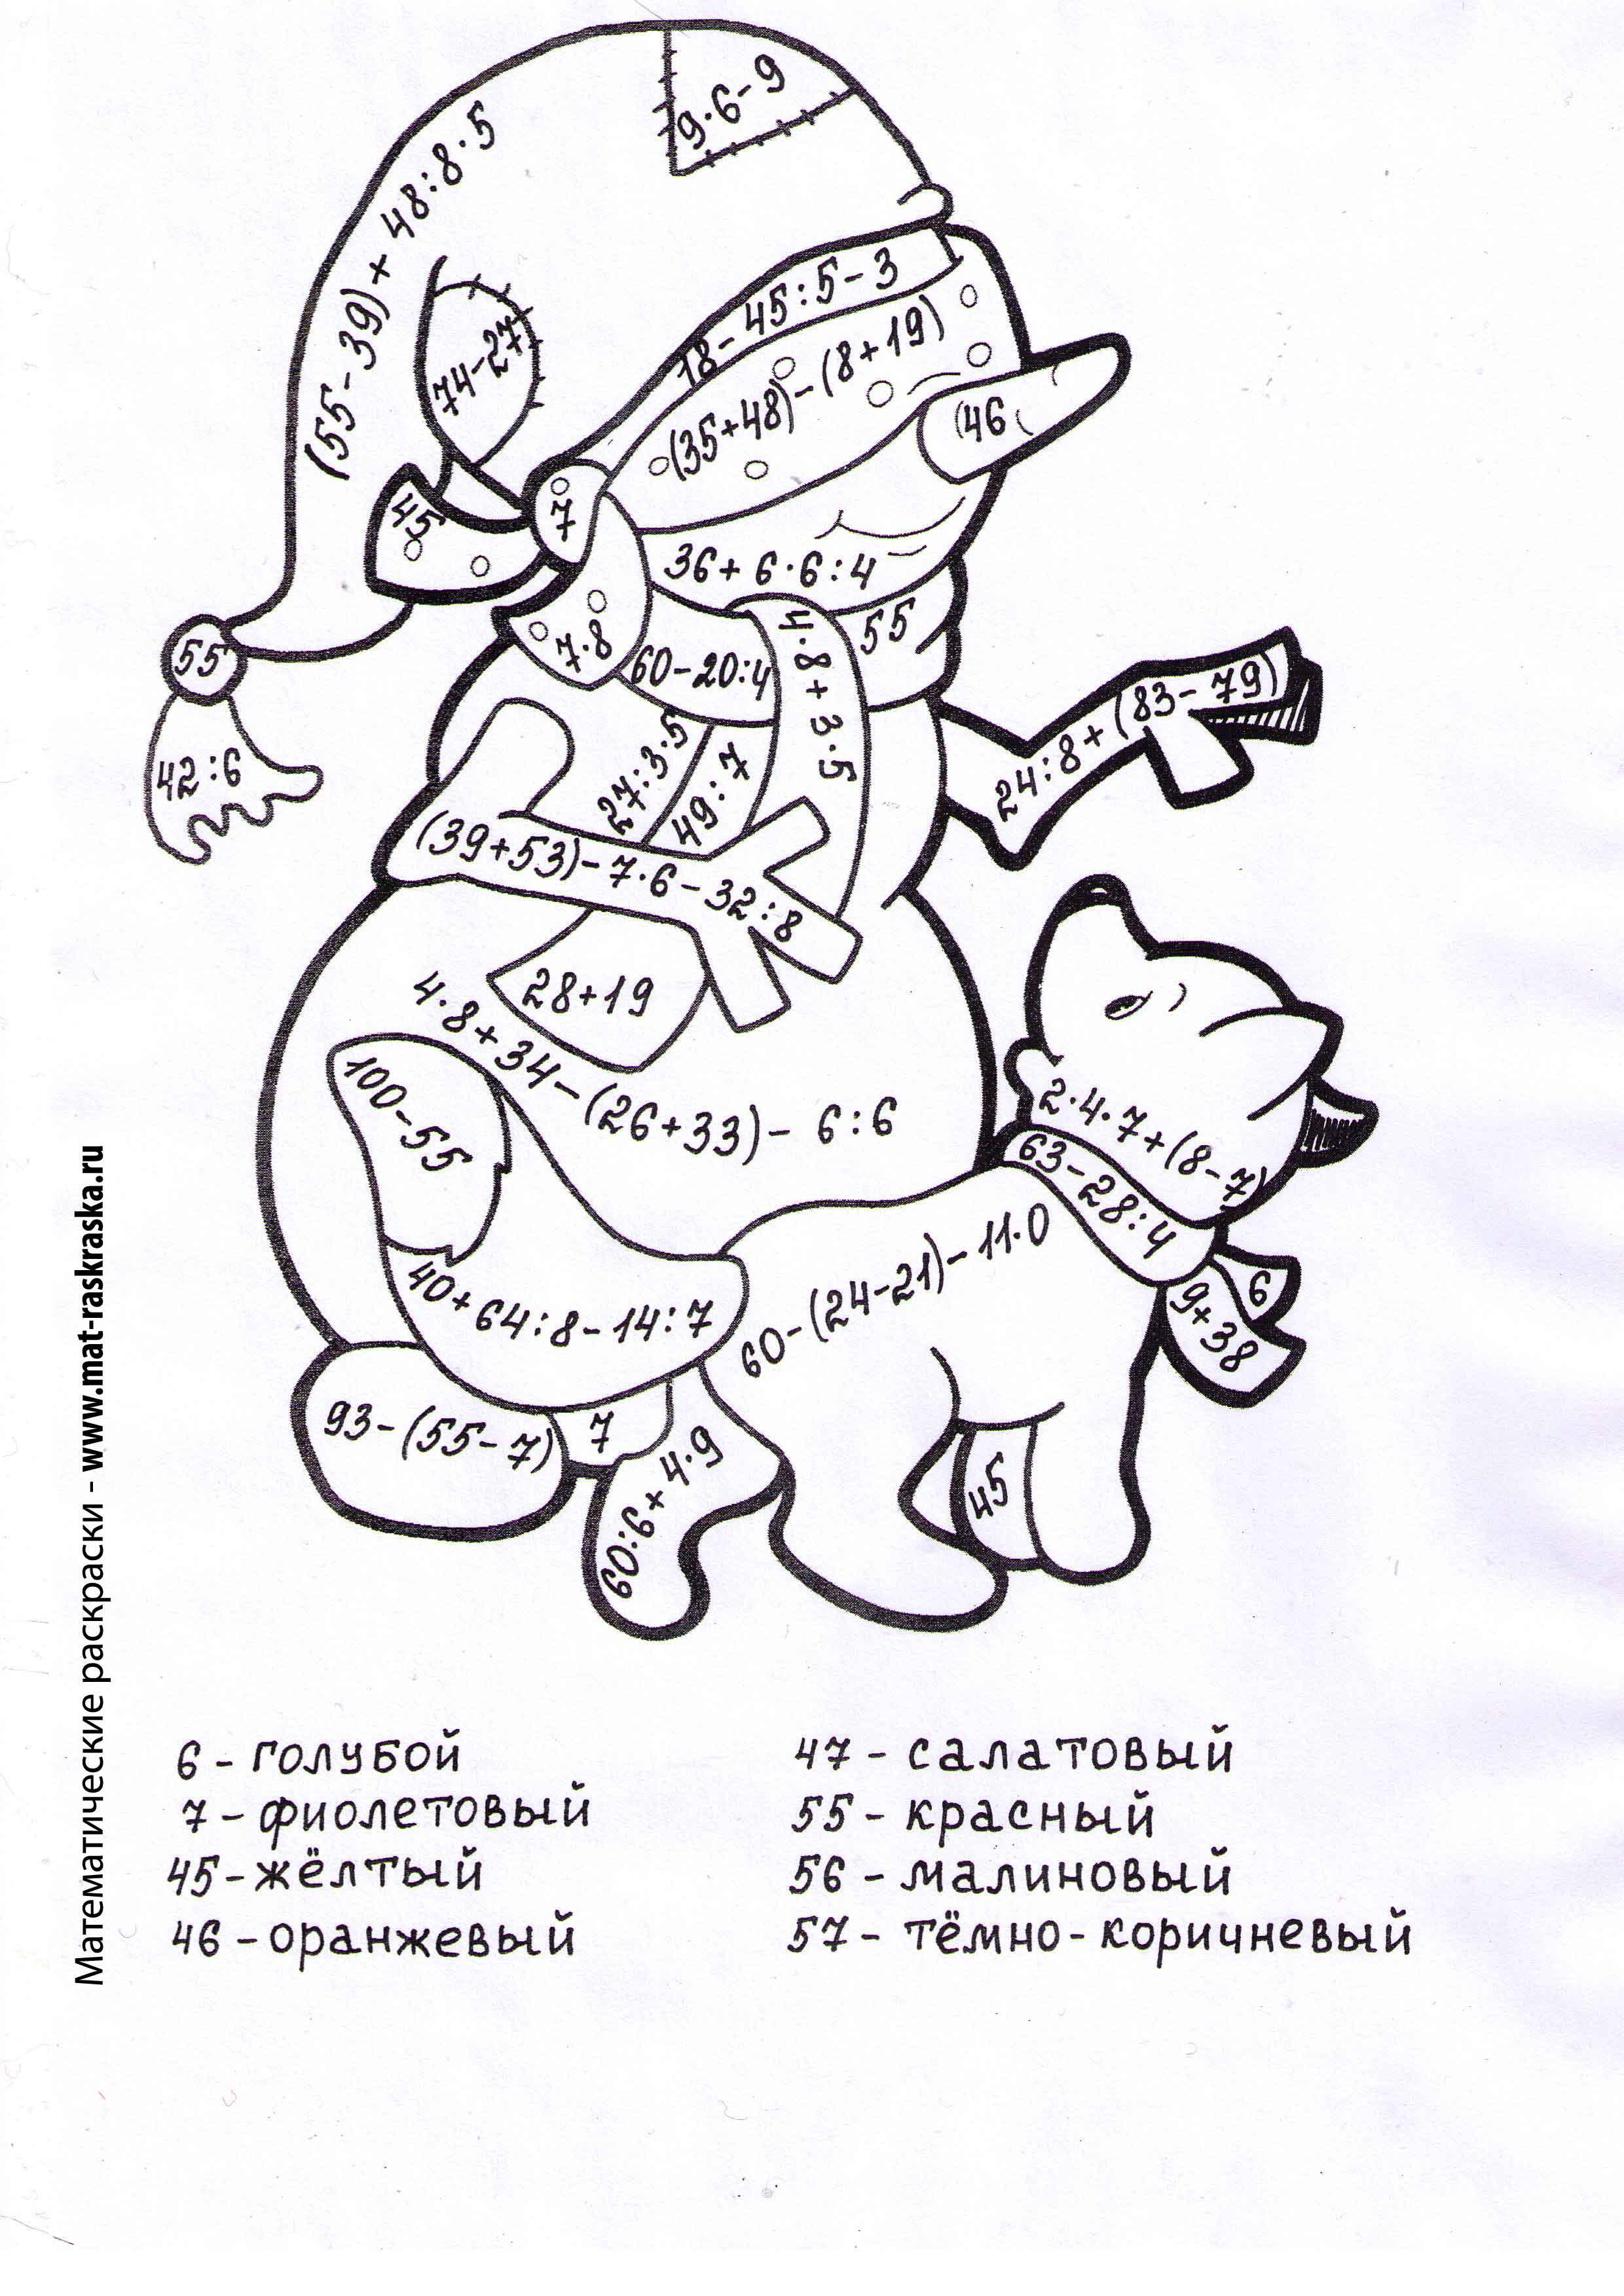 http://www.mat-raskraska.ru/images/stories/Raskraski/Tablitsa-umnozenia-delenia/snegovik-viraj-v-neskolko-deistvii_big.jpg